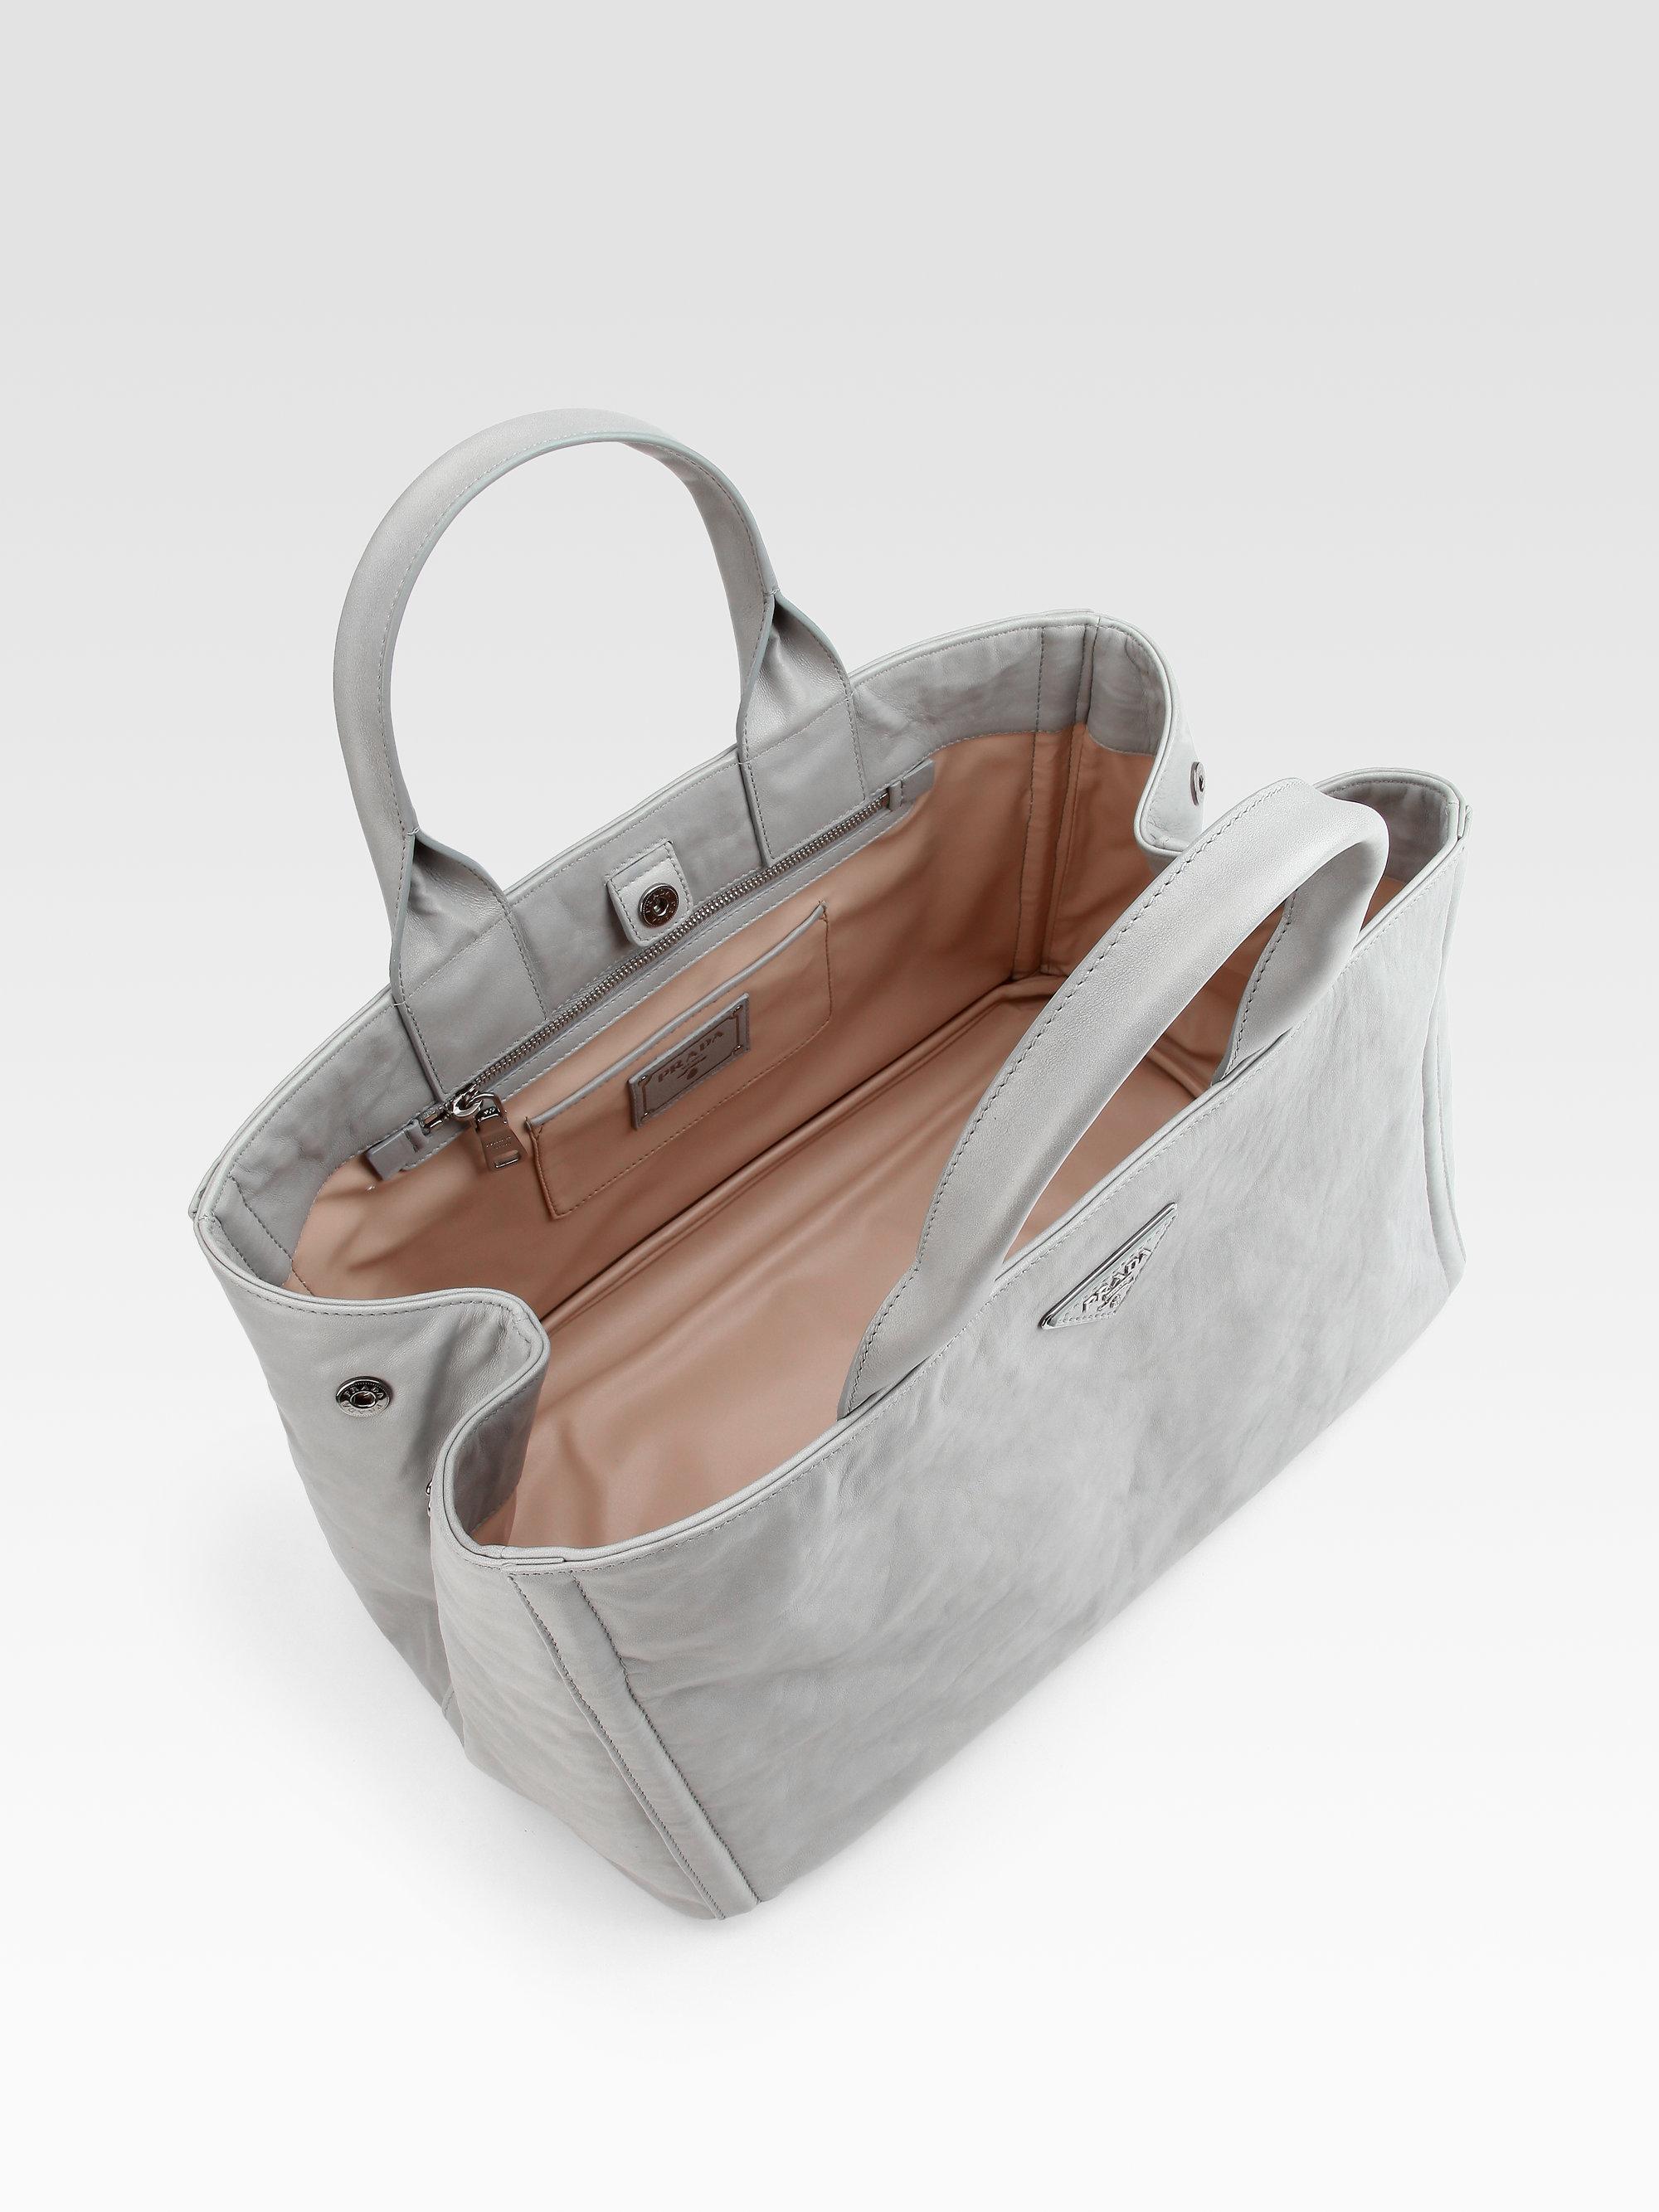 Prada Nappa Antique East/west Tote Bag in Gray (grey) | Lyst